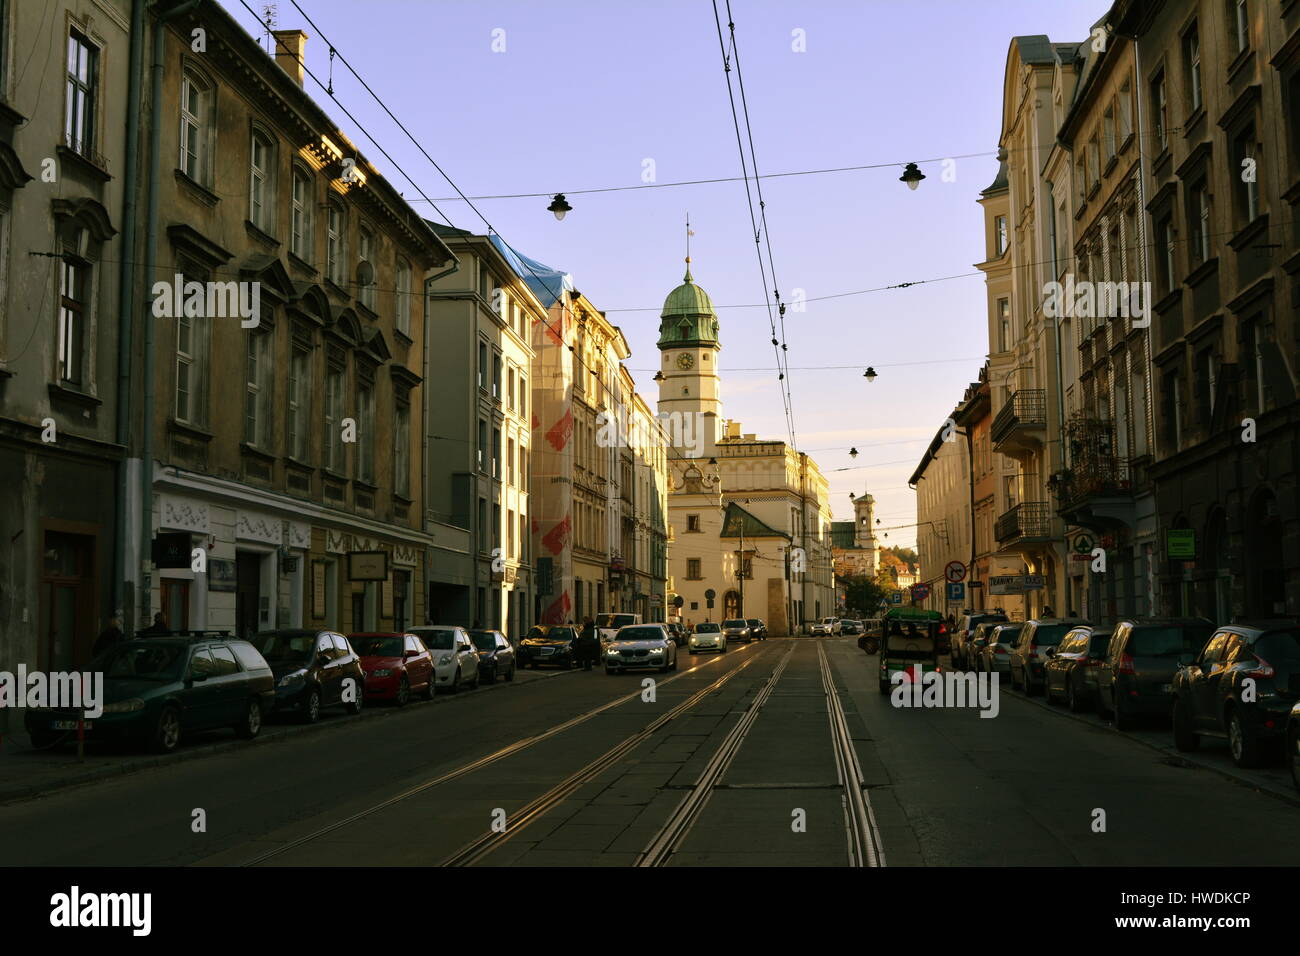 Street in Krakow, Poland - Stock Image